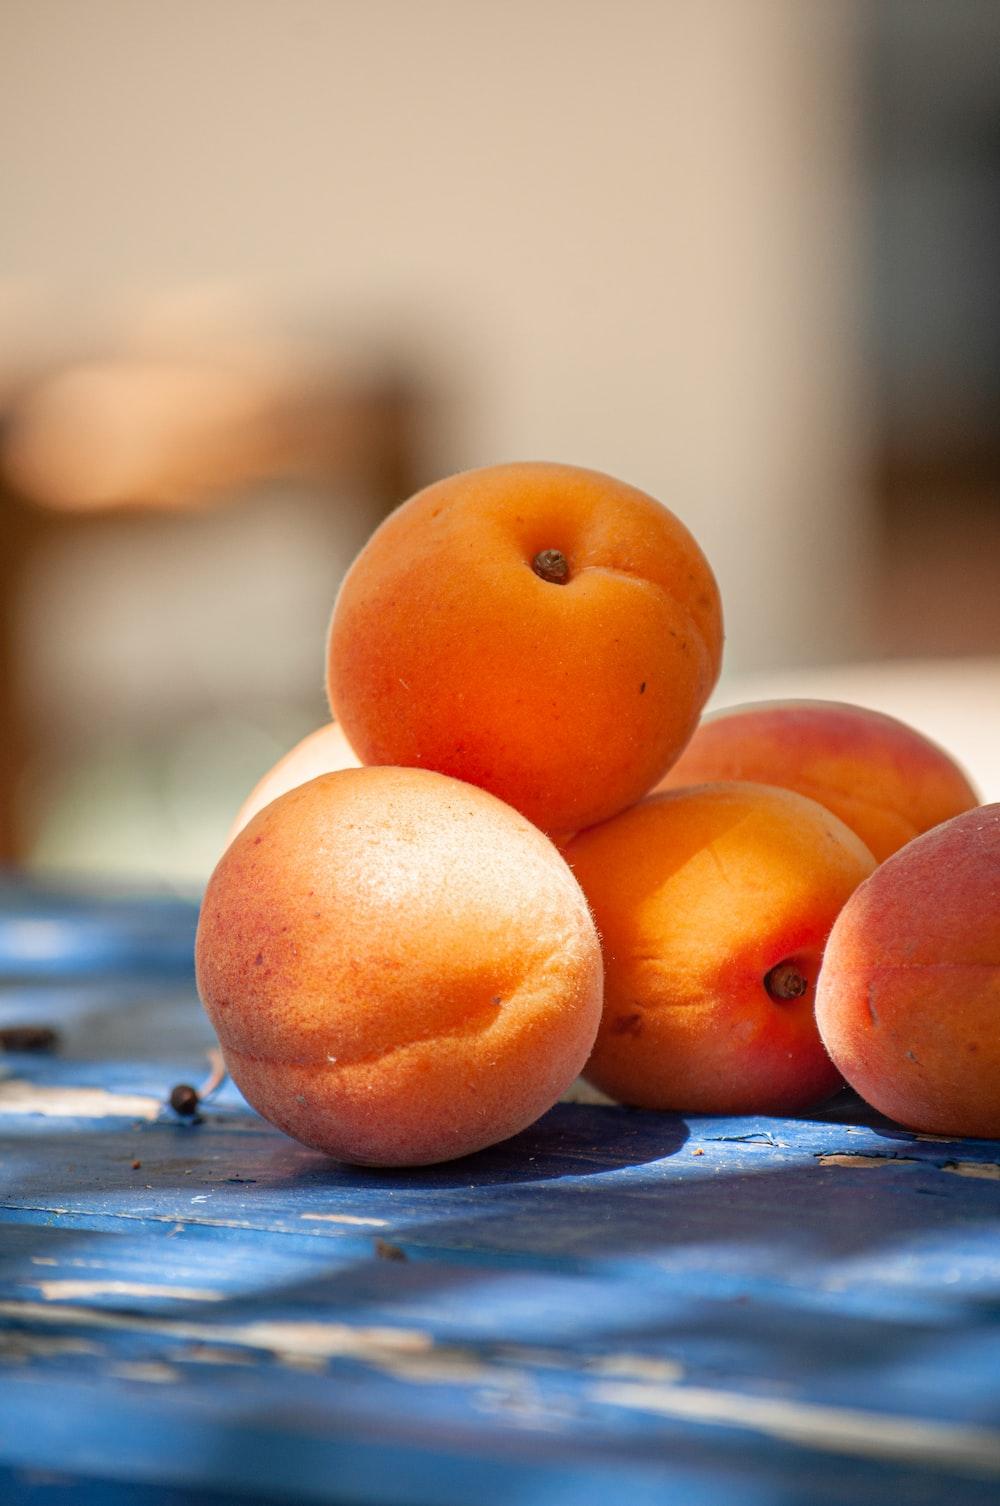 three orange fruits on blue wooden table